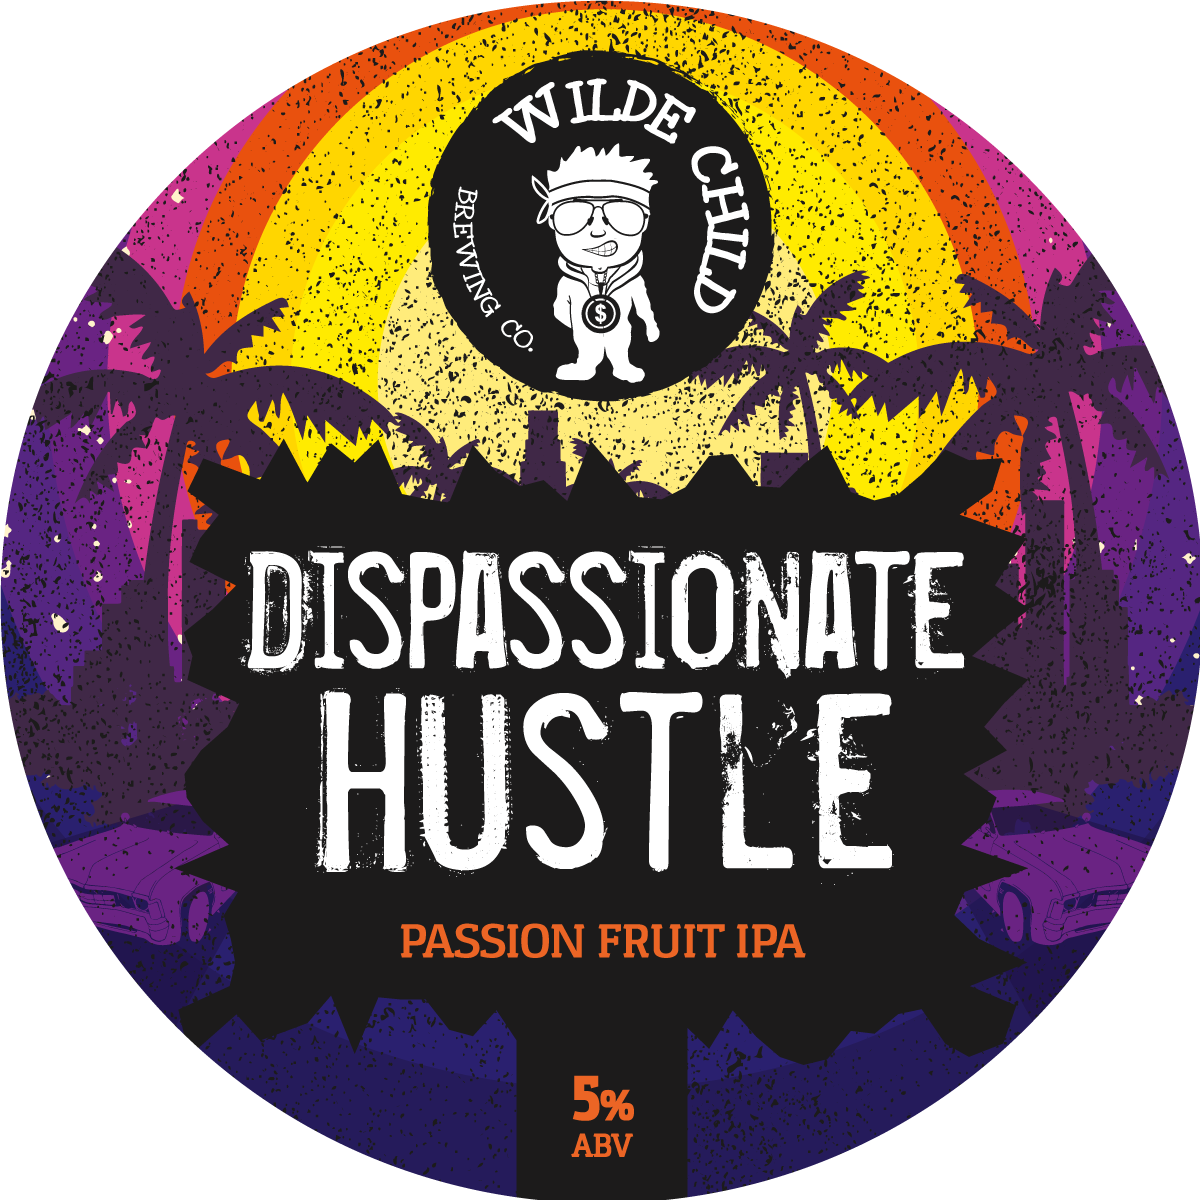 Dispassionate-Hustle-Mail-Chimp